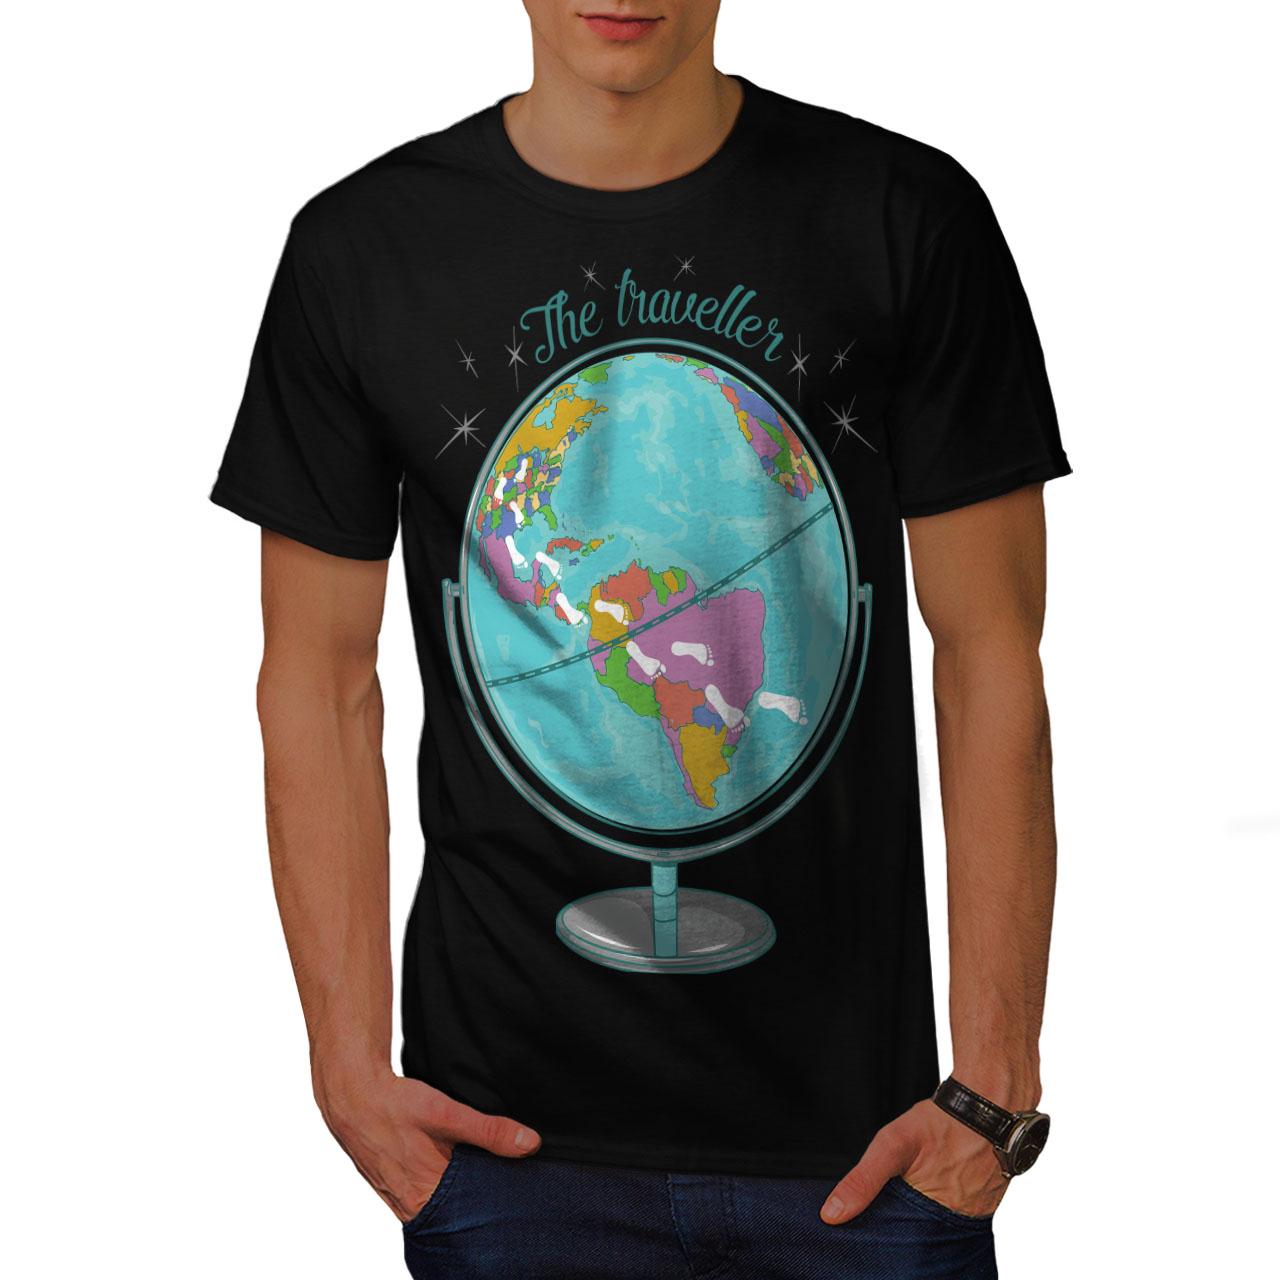 Wellcoda globe traveller mens t shirt world map graphic design wellcoda globe traveller mens t shirt world map gumiabroncs Images